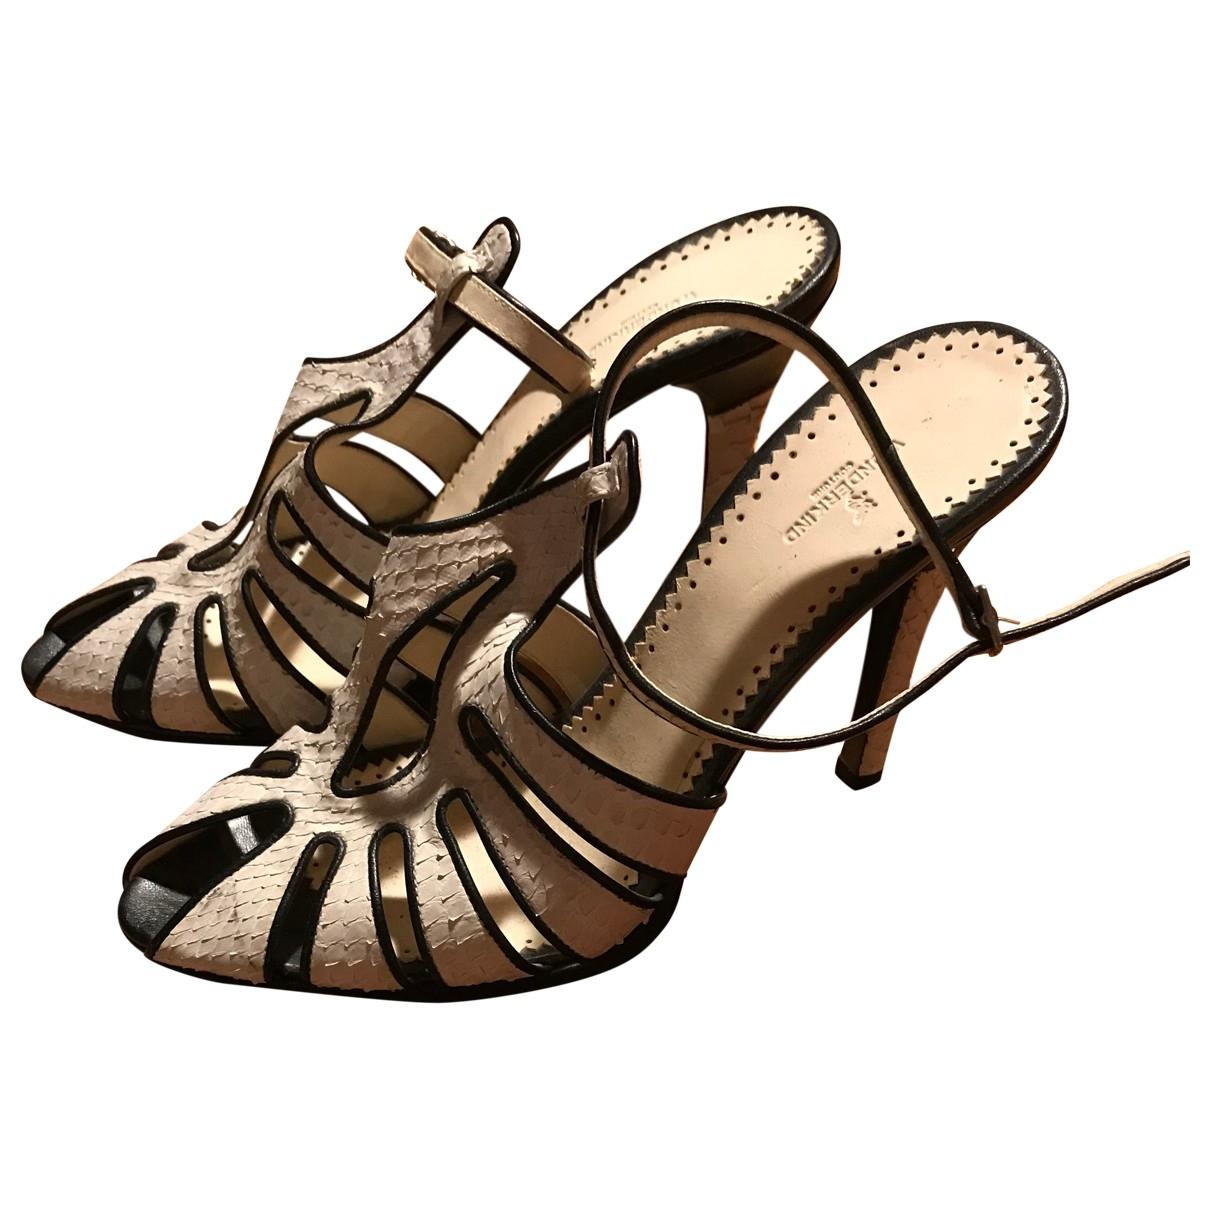 Sandalias de Cuero Wunderkind